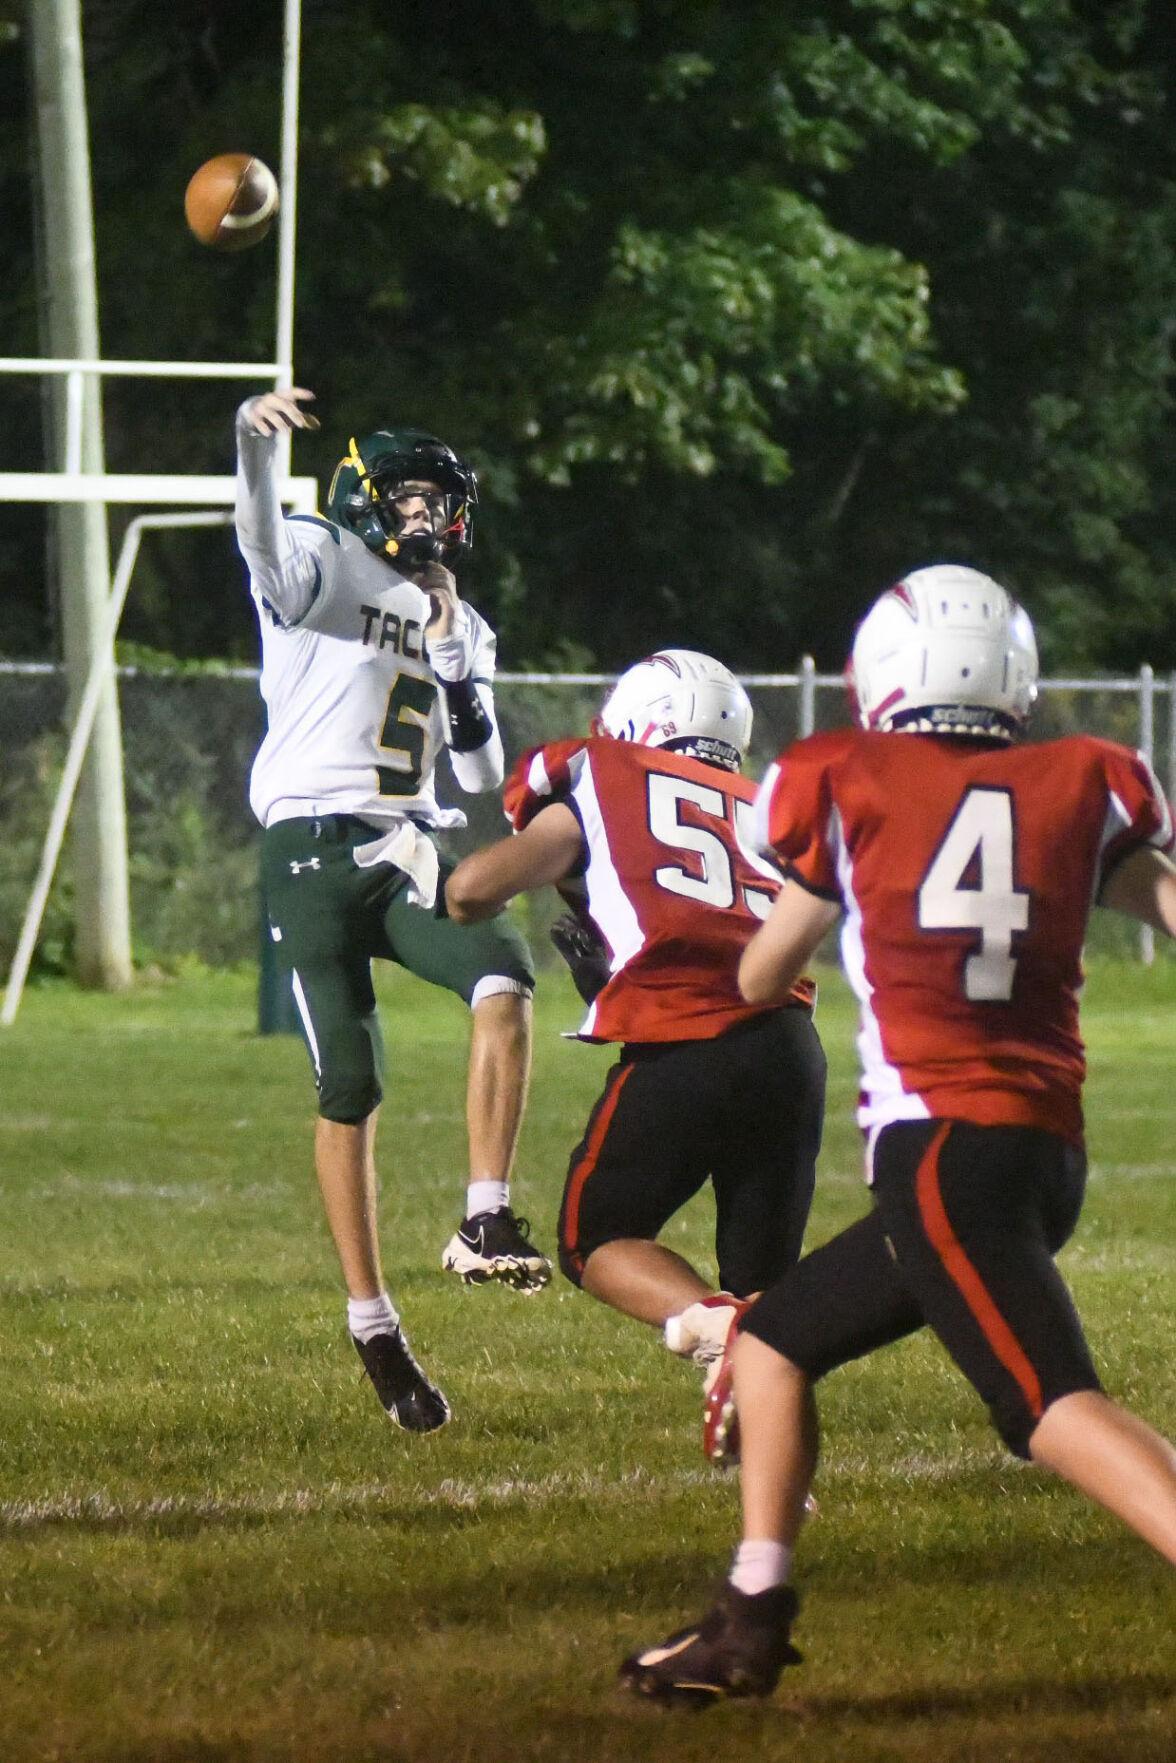 Taconic's McIntosh passes the ball